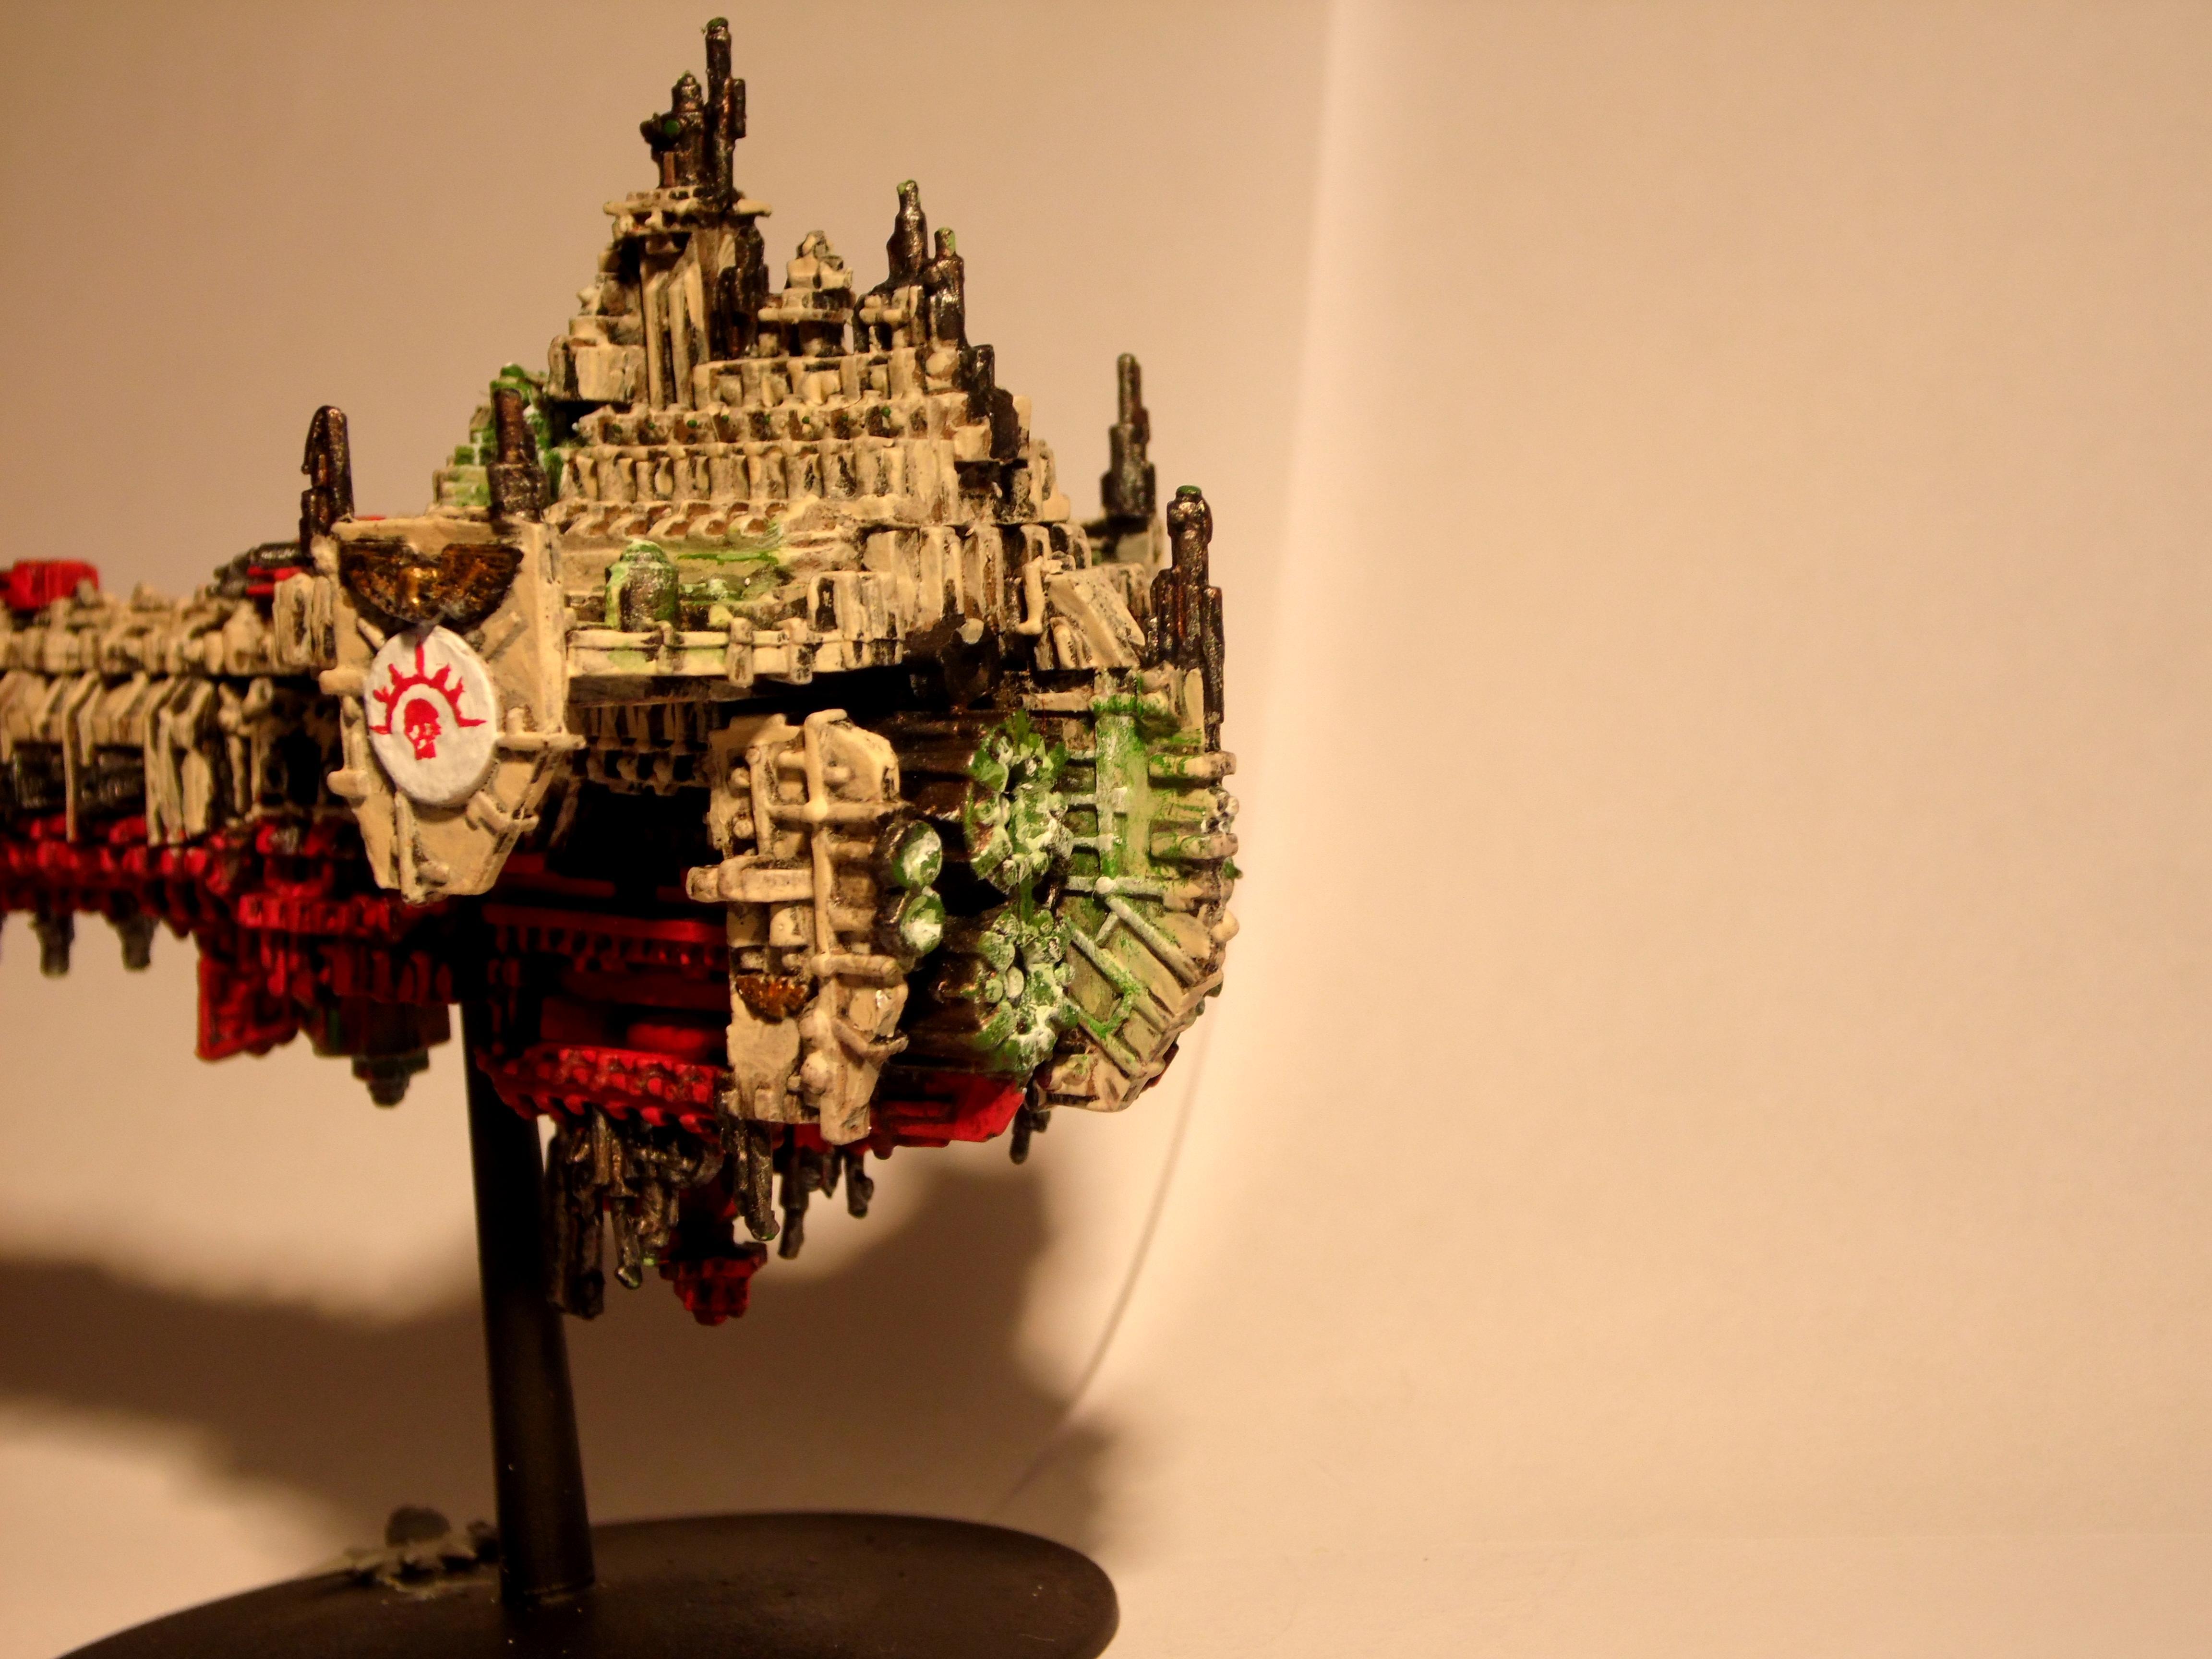 Apoca, Battlefleet Gothic, Battleship